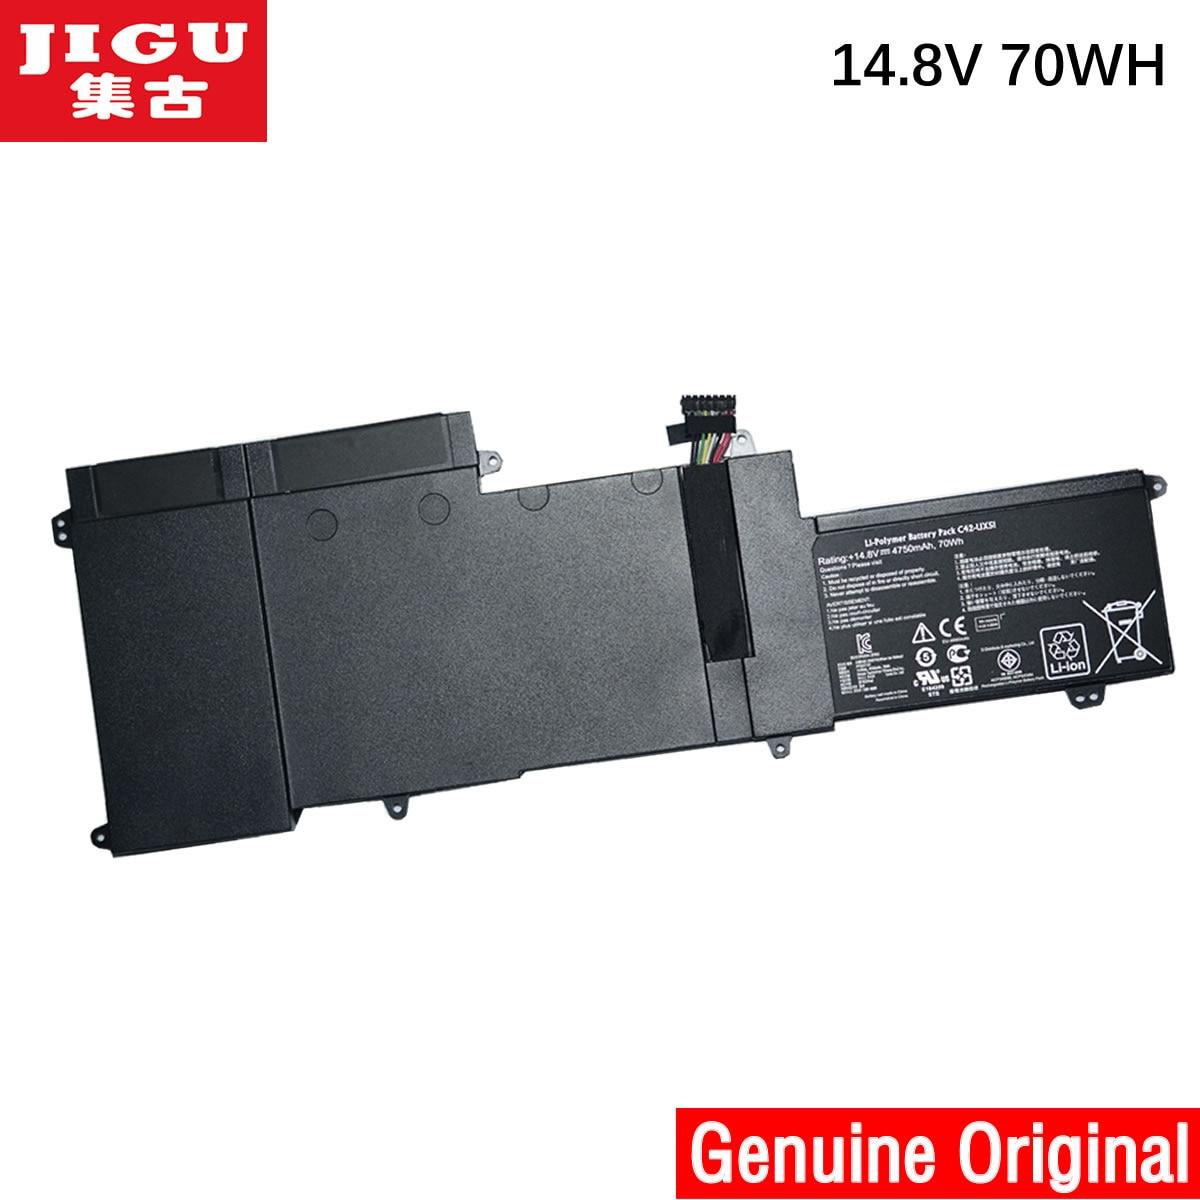 JIGU Original Laptop Battery C42-UX51 For ASUS U500VZ UX51 SERIES UX51VZ UX51VZ-1A CN035H UX51VZA